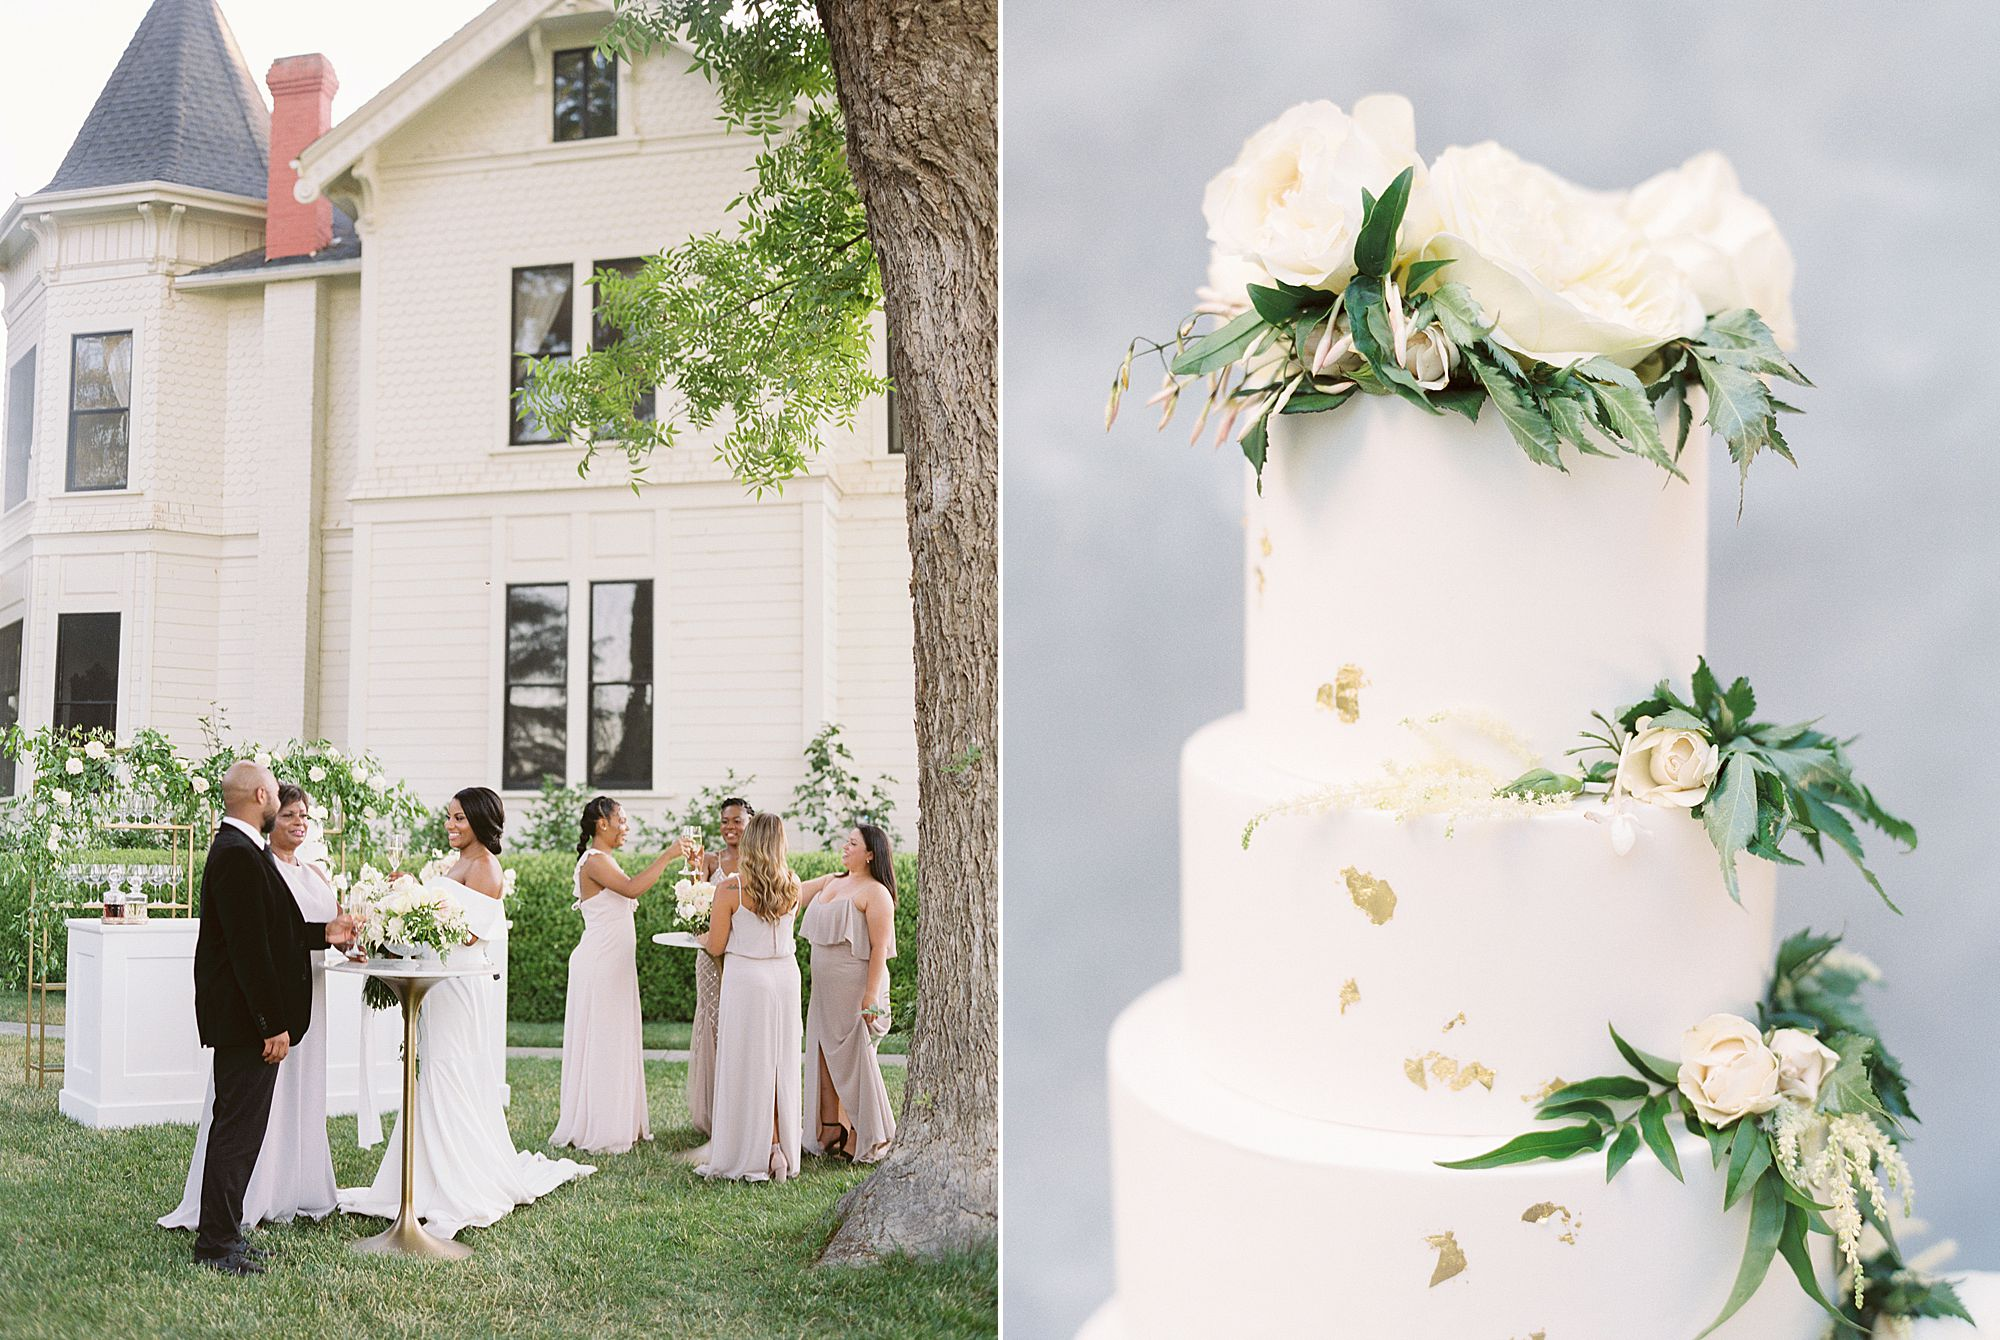 Park Winters Micro-Wedding Inspiration on Style Me Pretty - Stephanie Teague Events - Ashley Baumgartner - Park Winters Wedding - Black Tie Wedding - Micro-Wedding Sacramento Photographer_0021.jpg